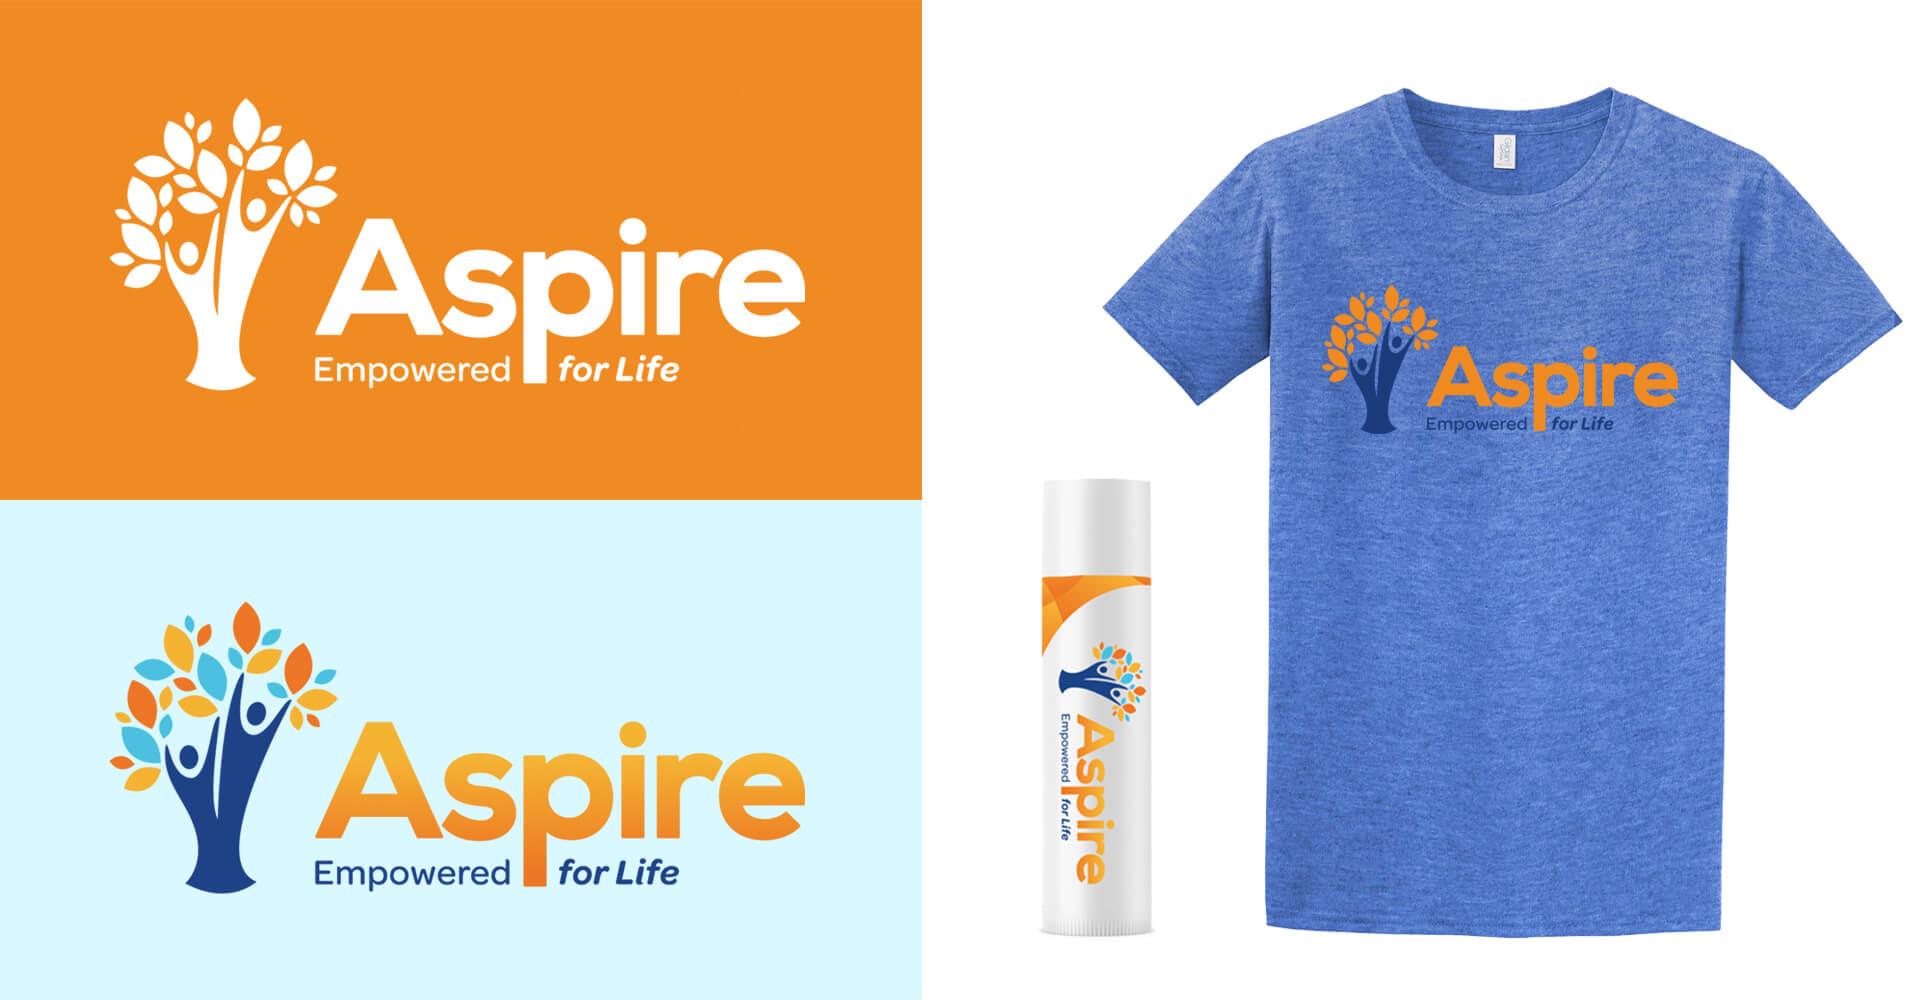 Aspire brand elements logo on orange and light blue t-shirt and lip balm